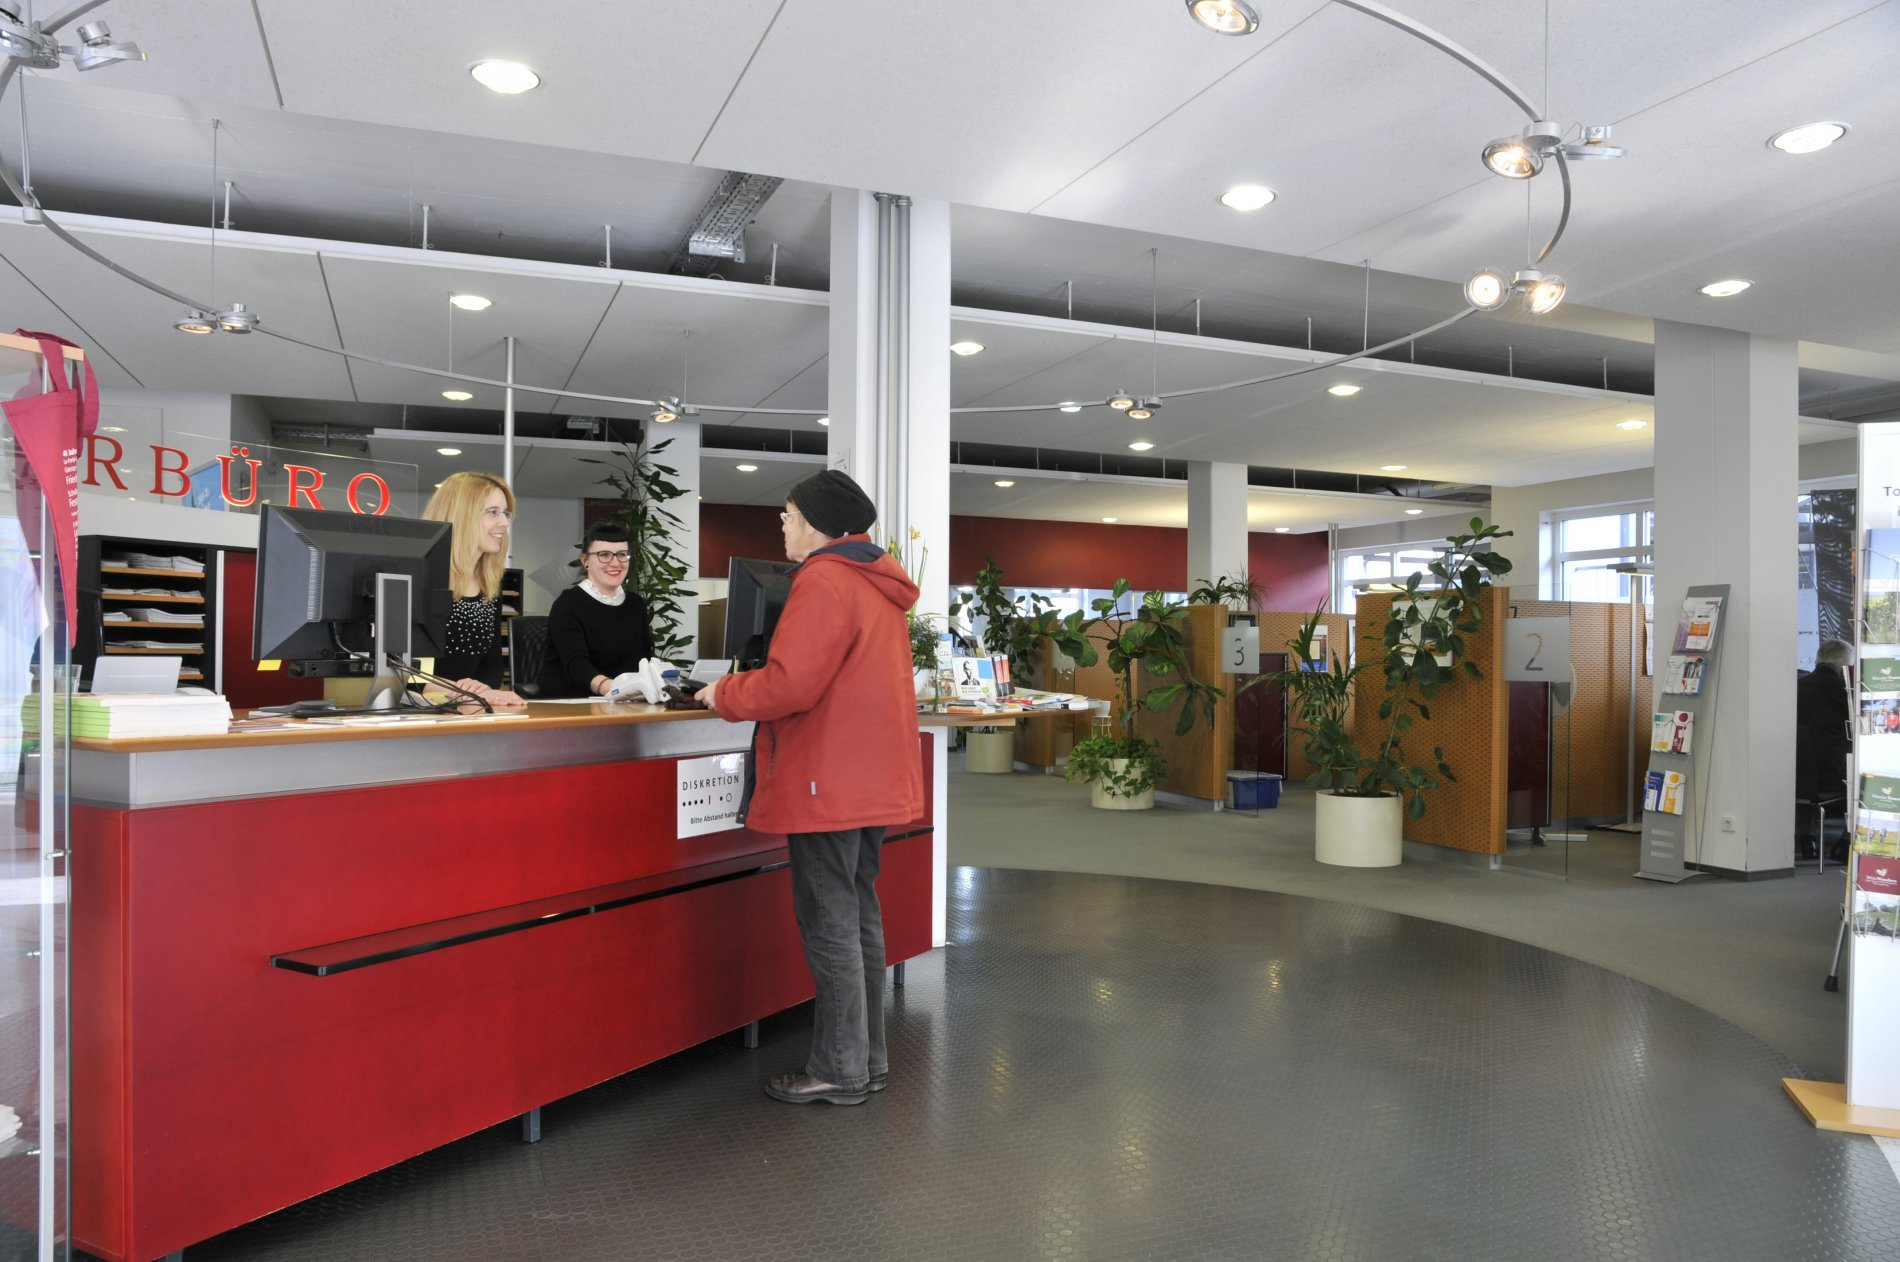 Touristinformation im Bürgerbüro Lauffen a.N.